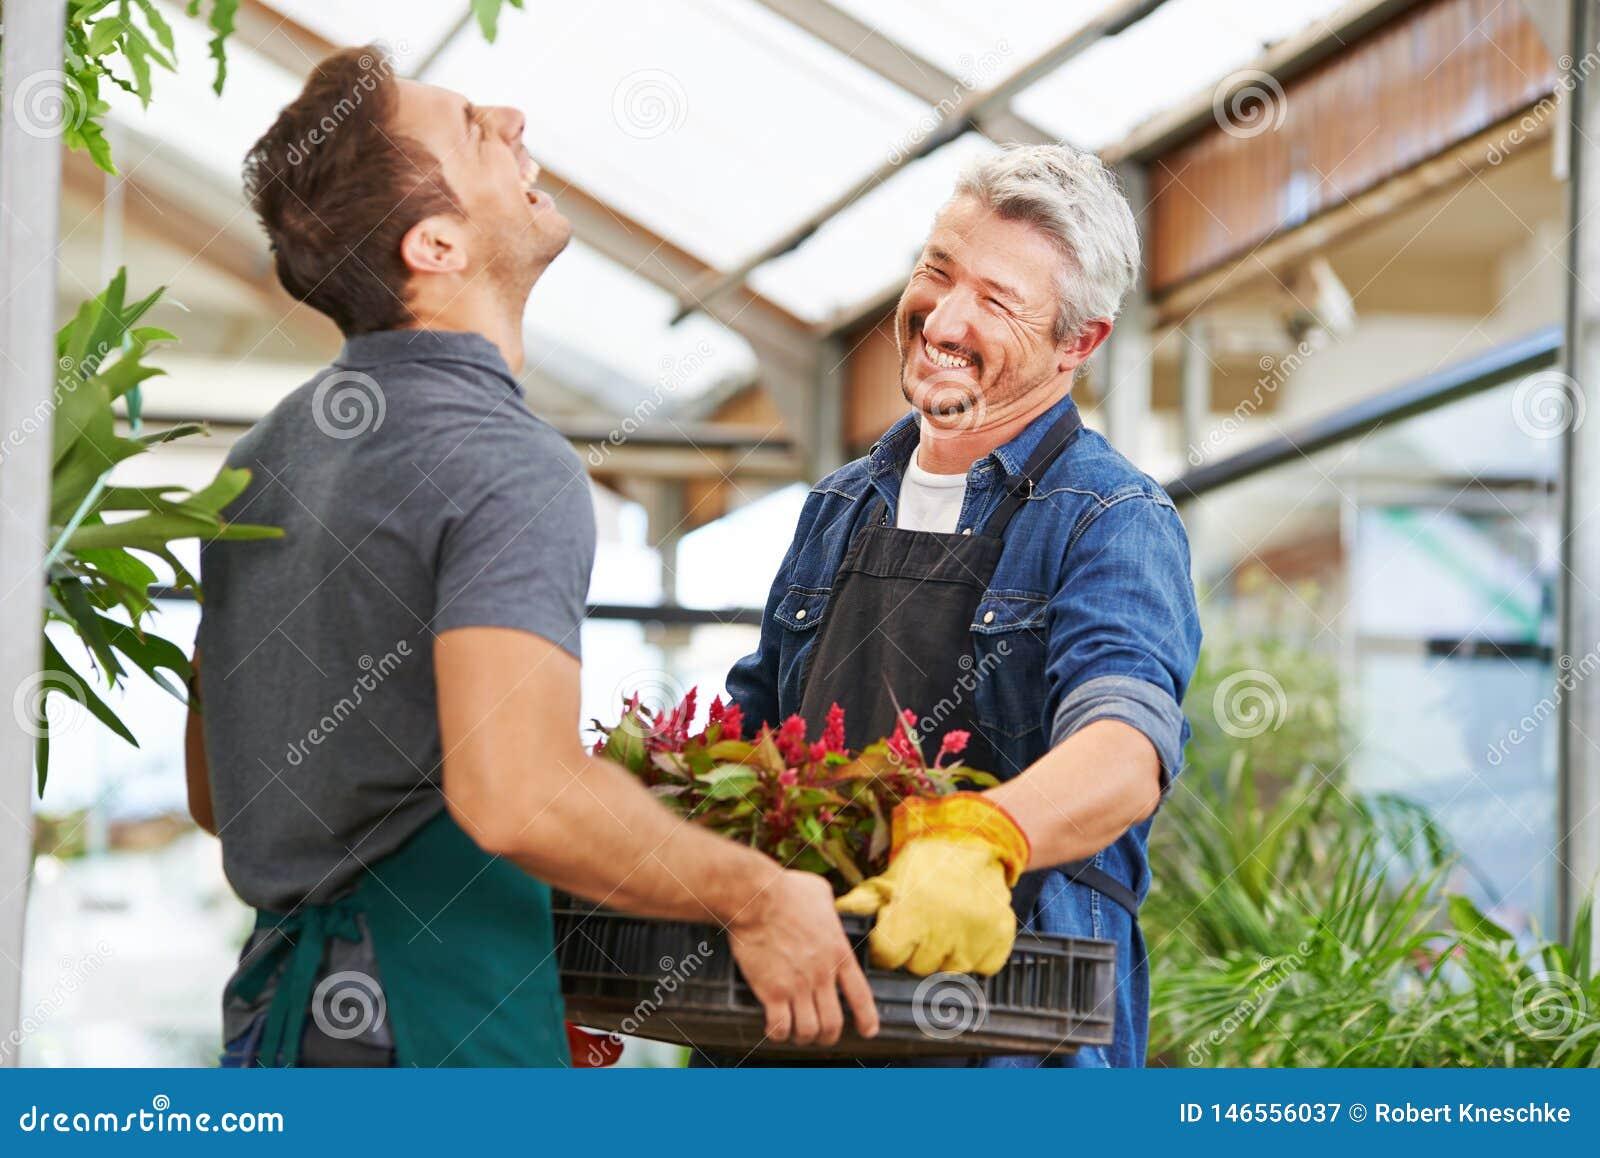 Two men as florists in gardening